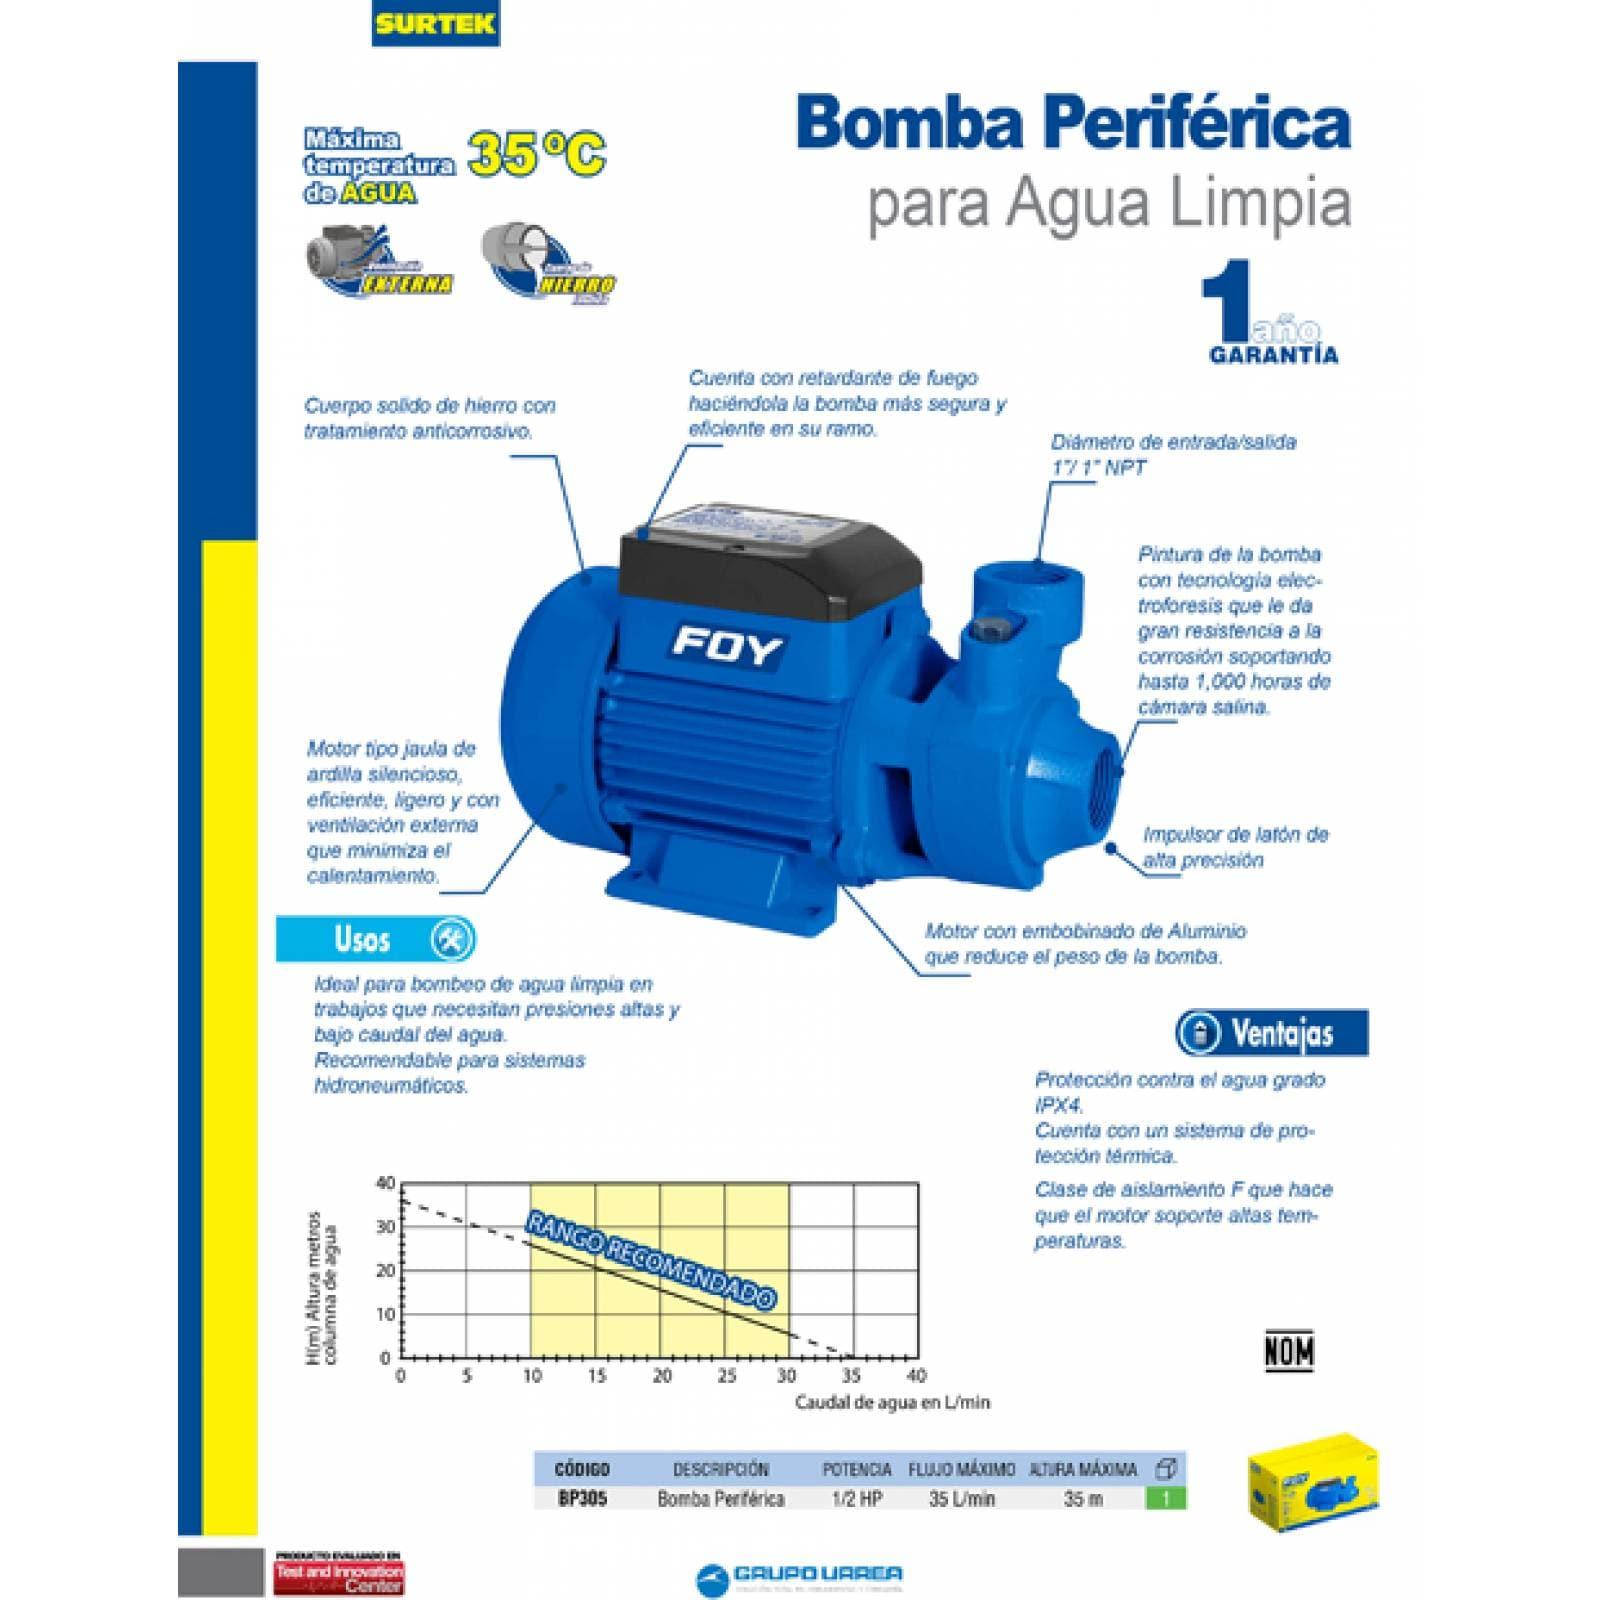 Bomba Periferica De 1/2 Hp Altura Máxima De 35M BP305 Foy